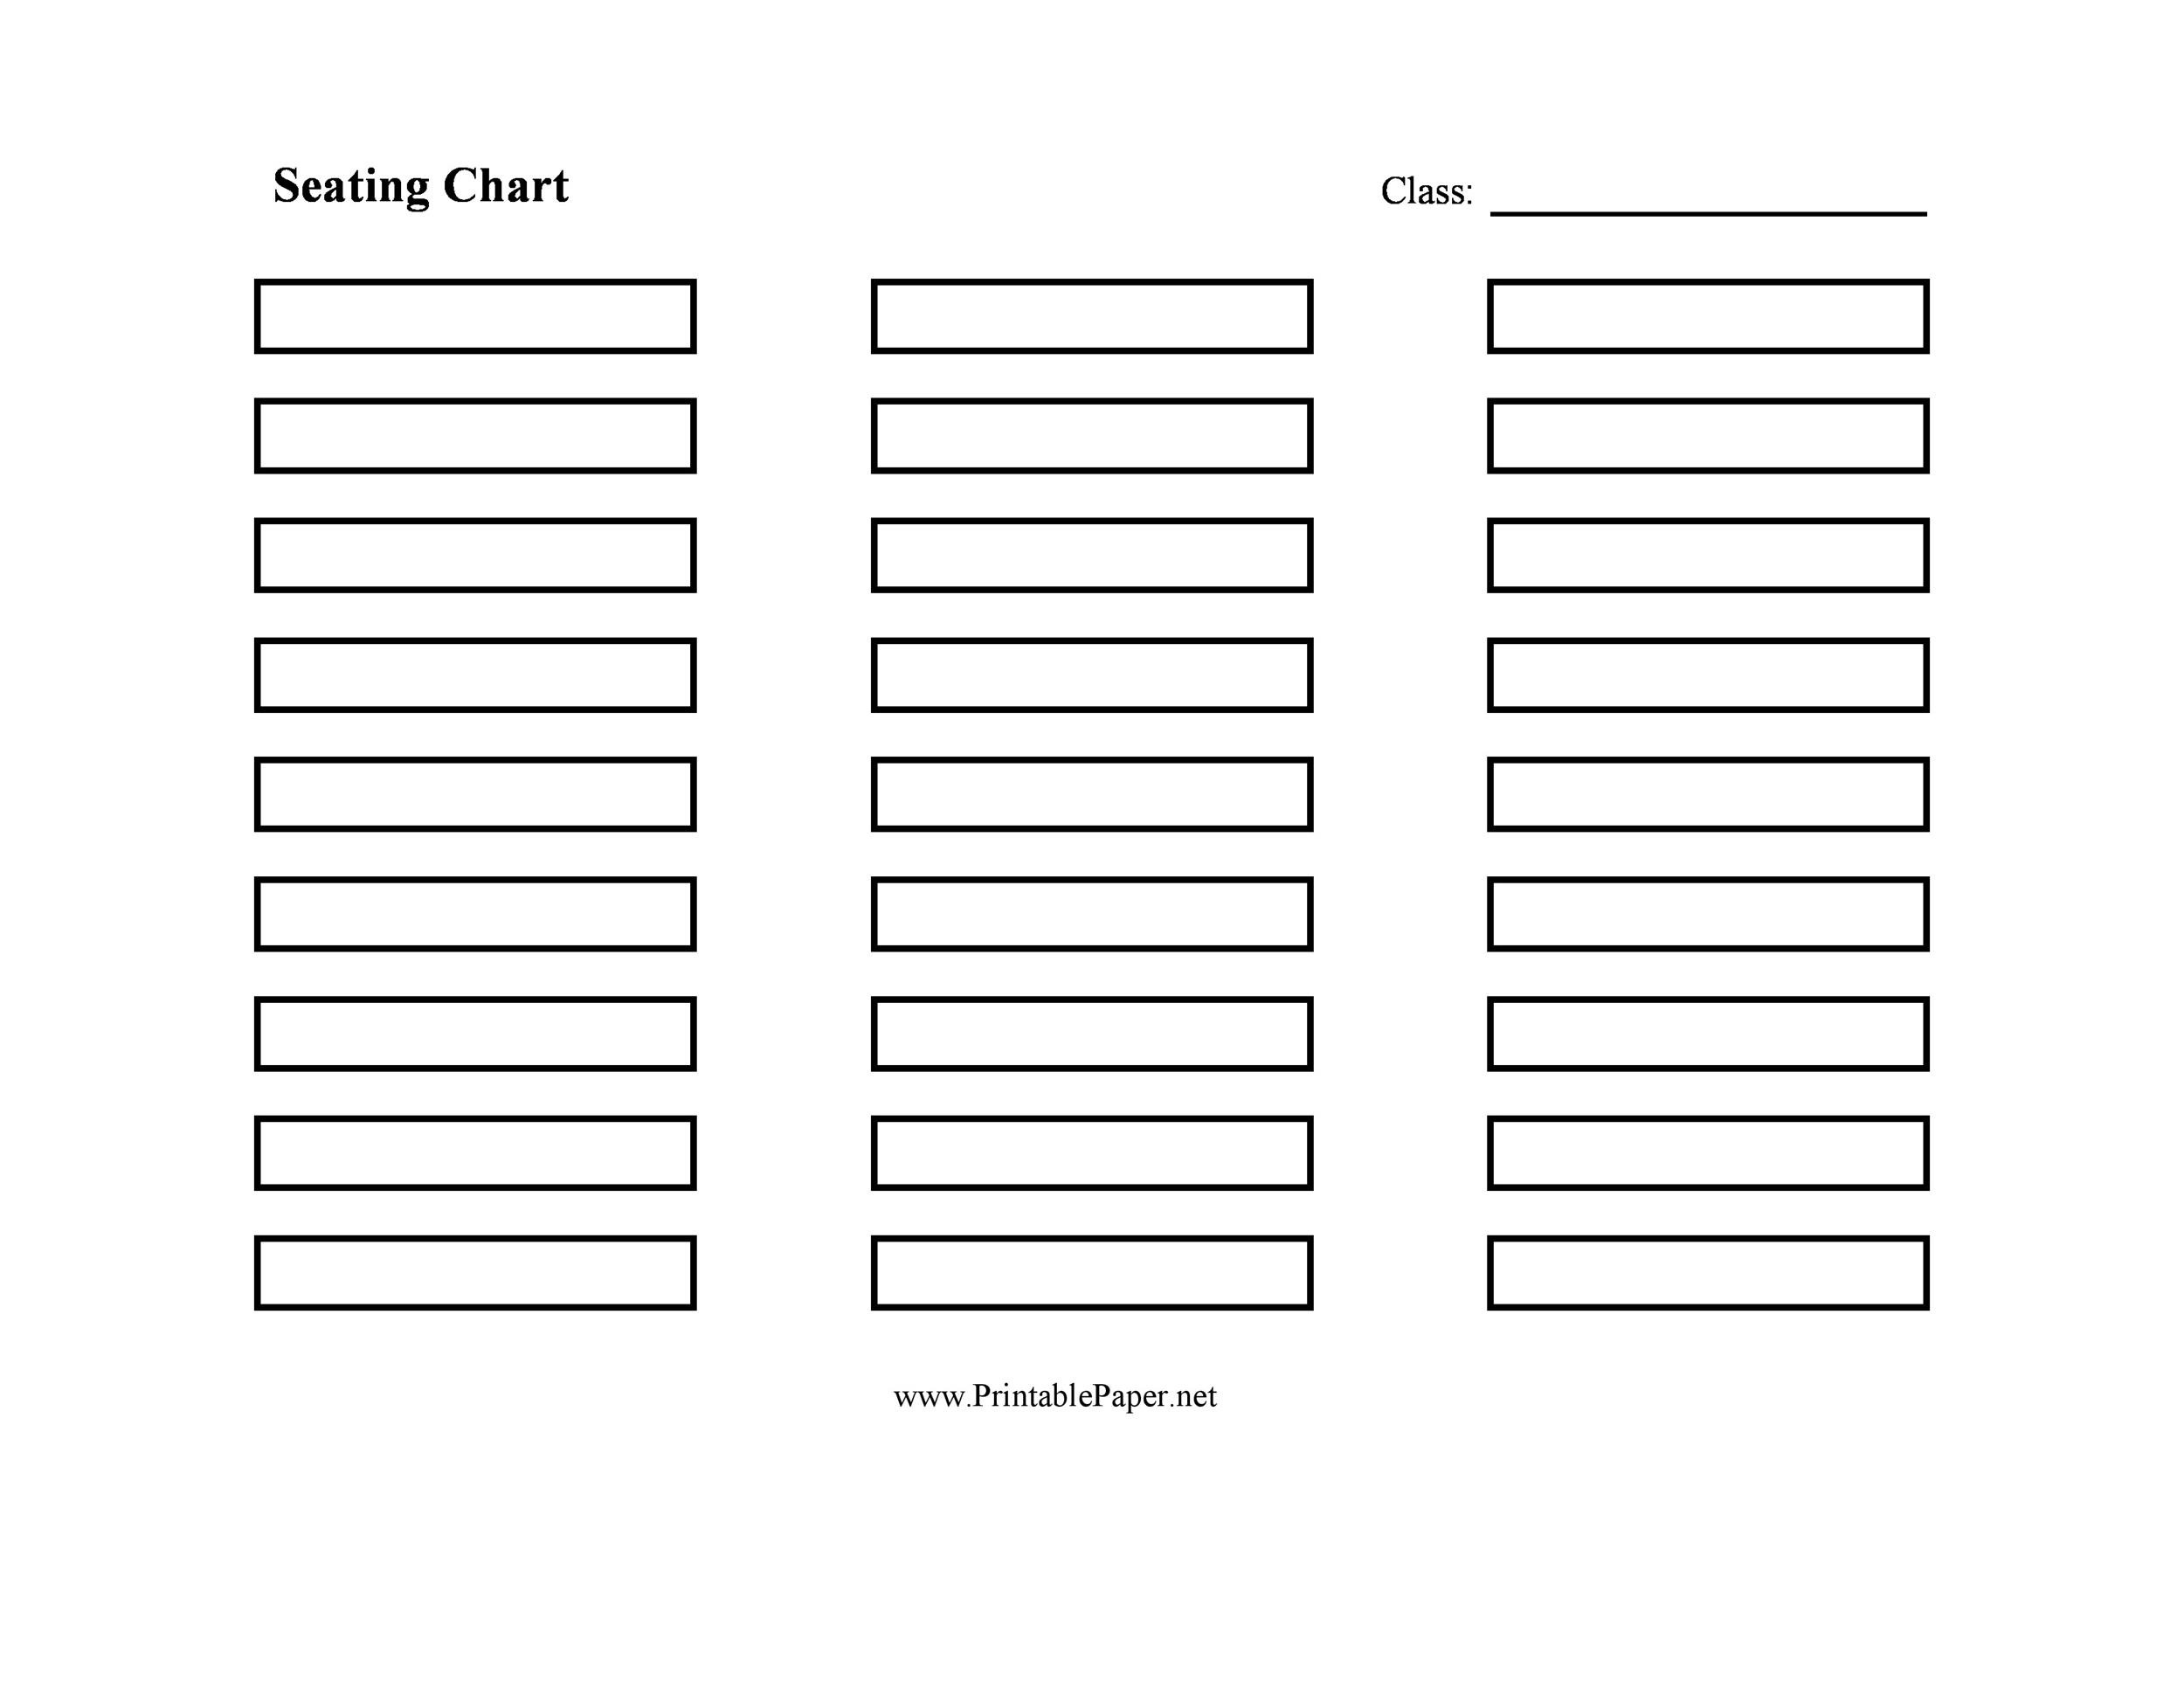 seating chart template - fototango